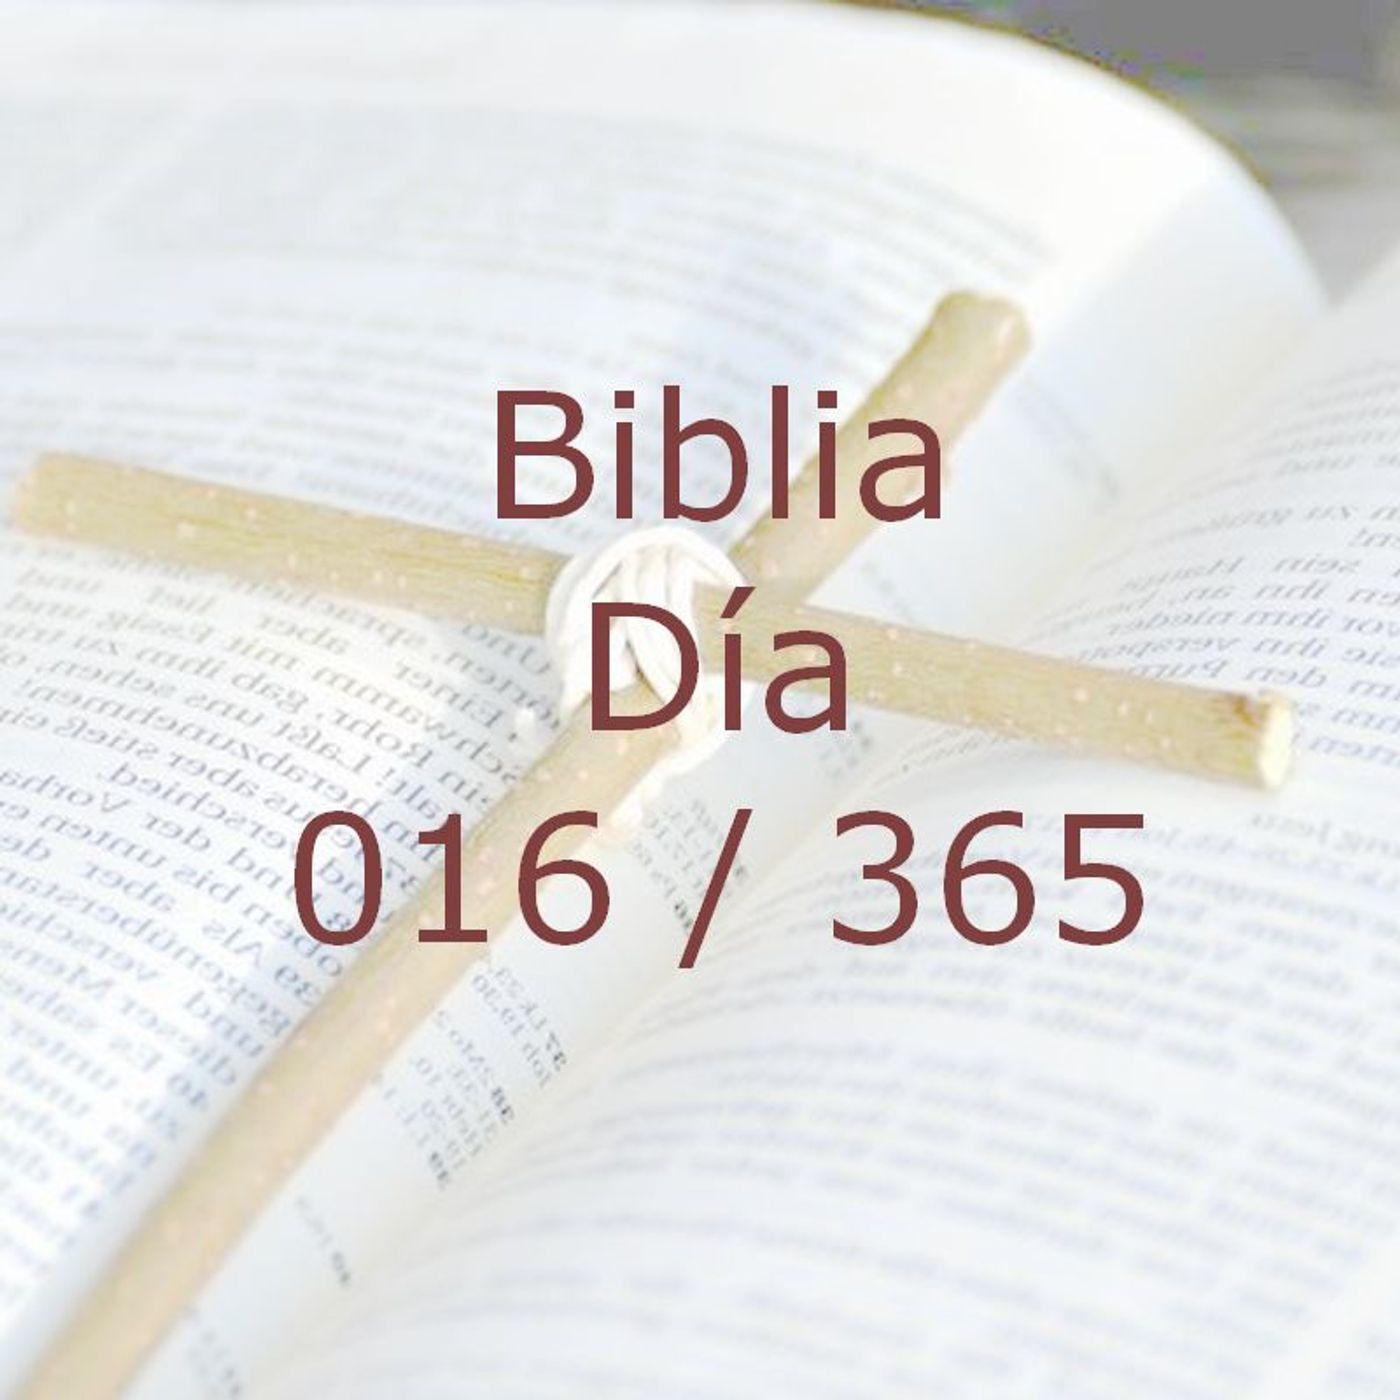 365 dias para la Biblia - Dia 016